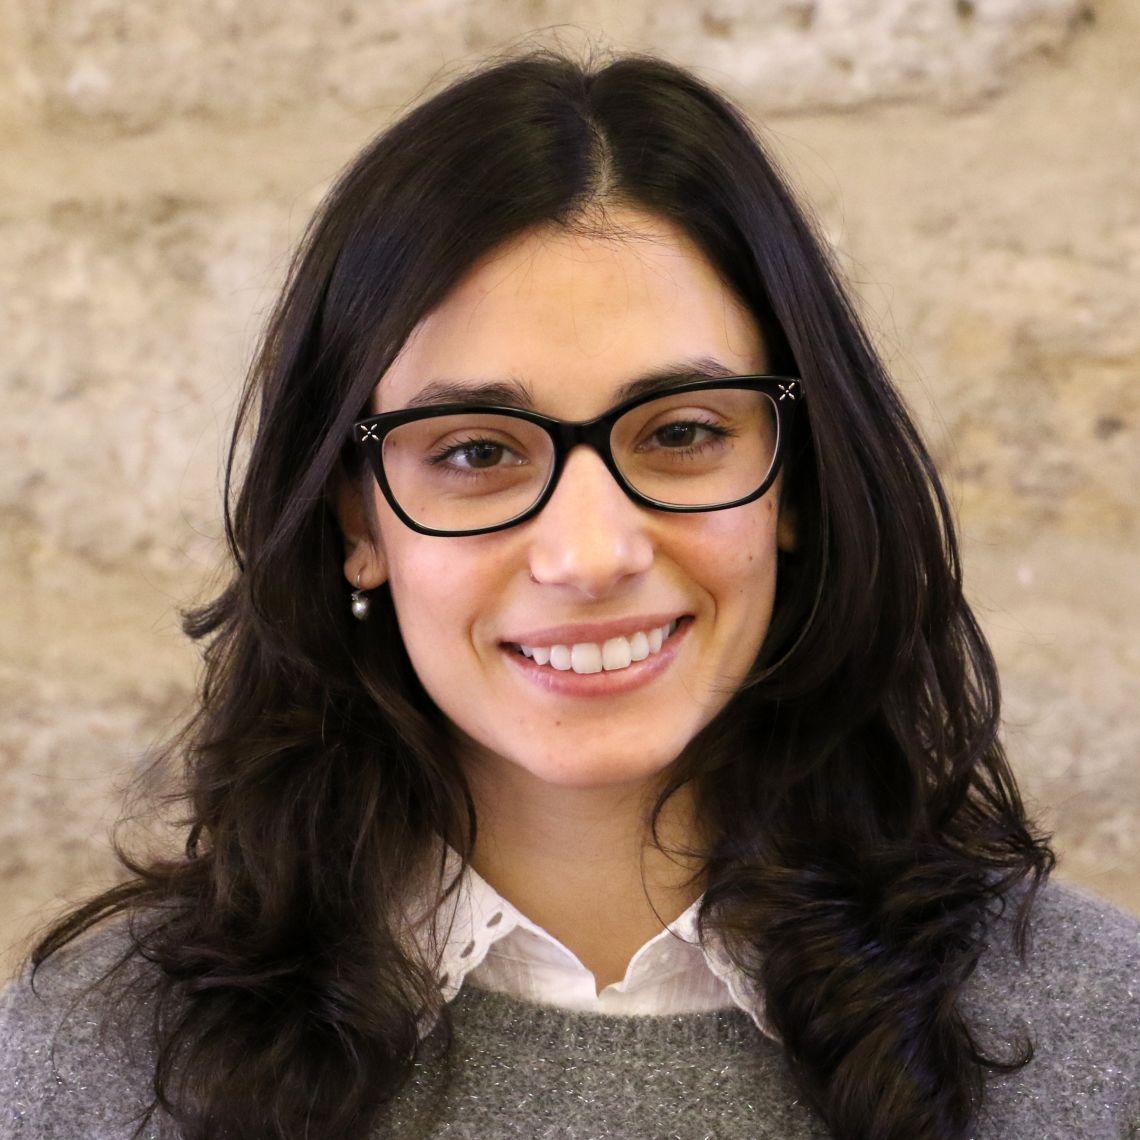 Arianna Manzini